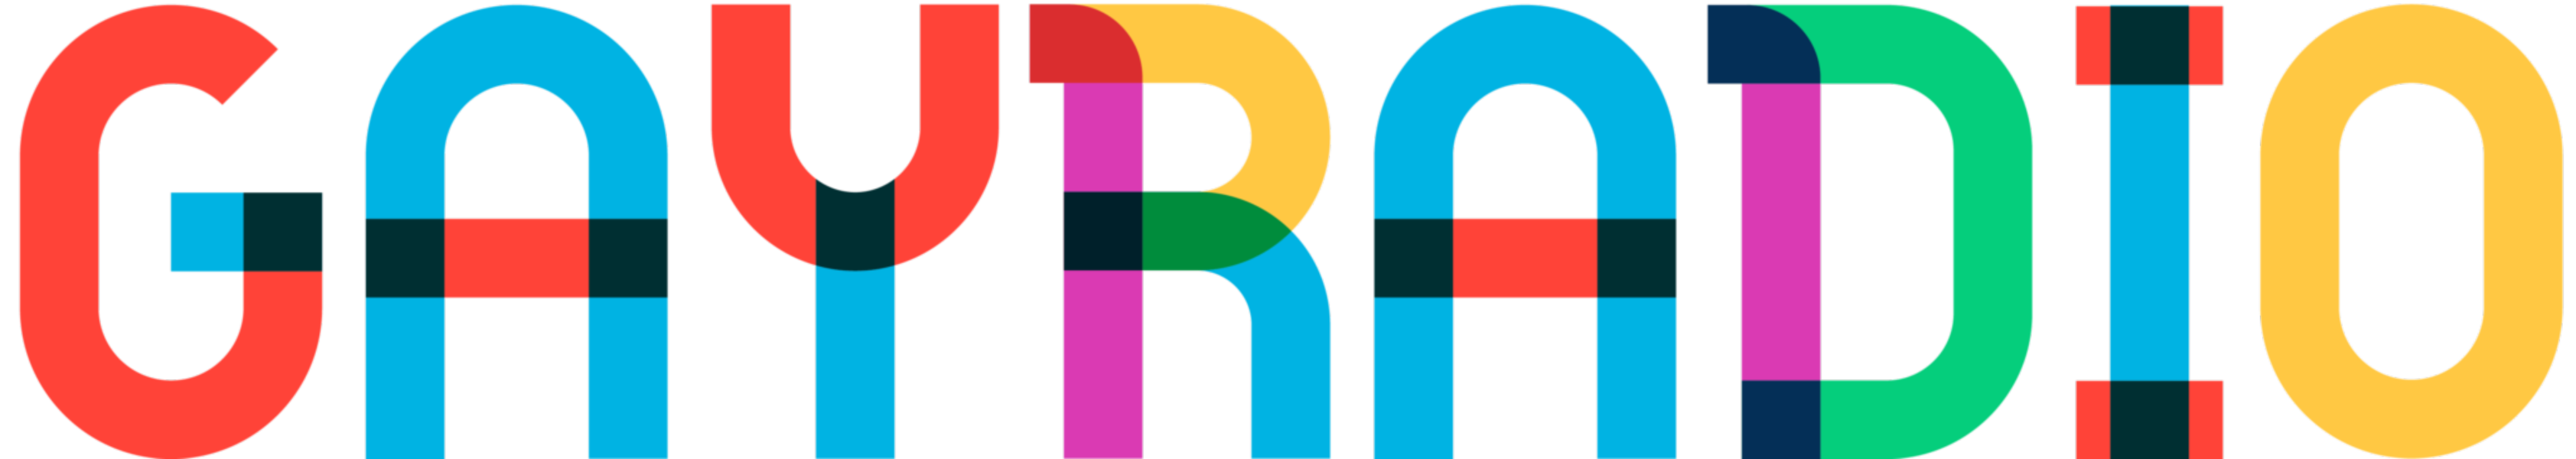 gayradio_logo.png